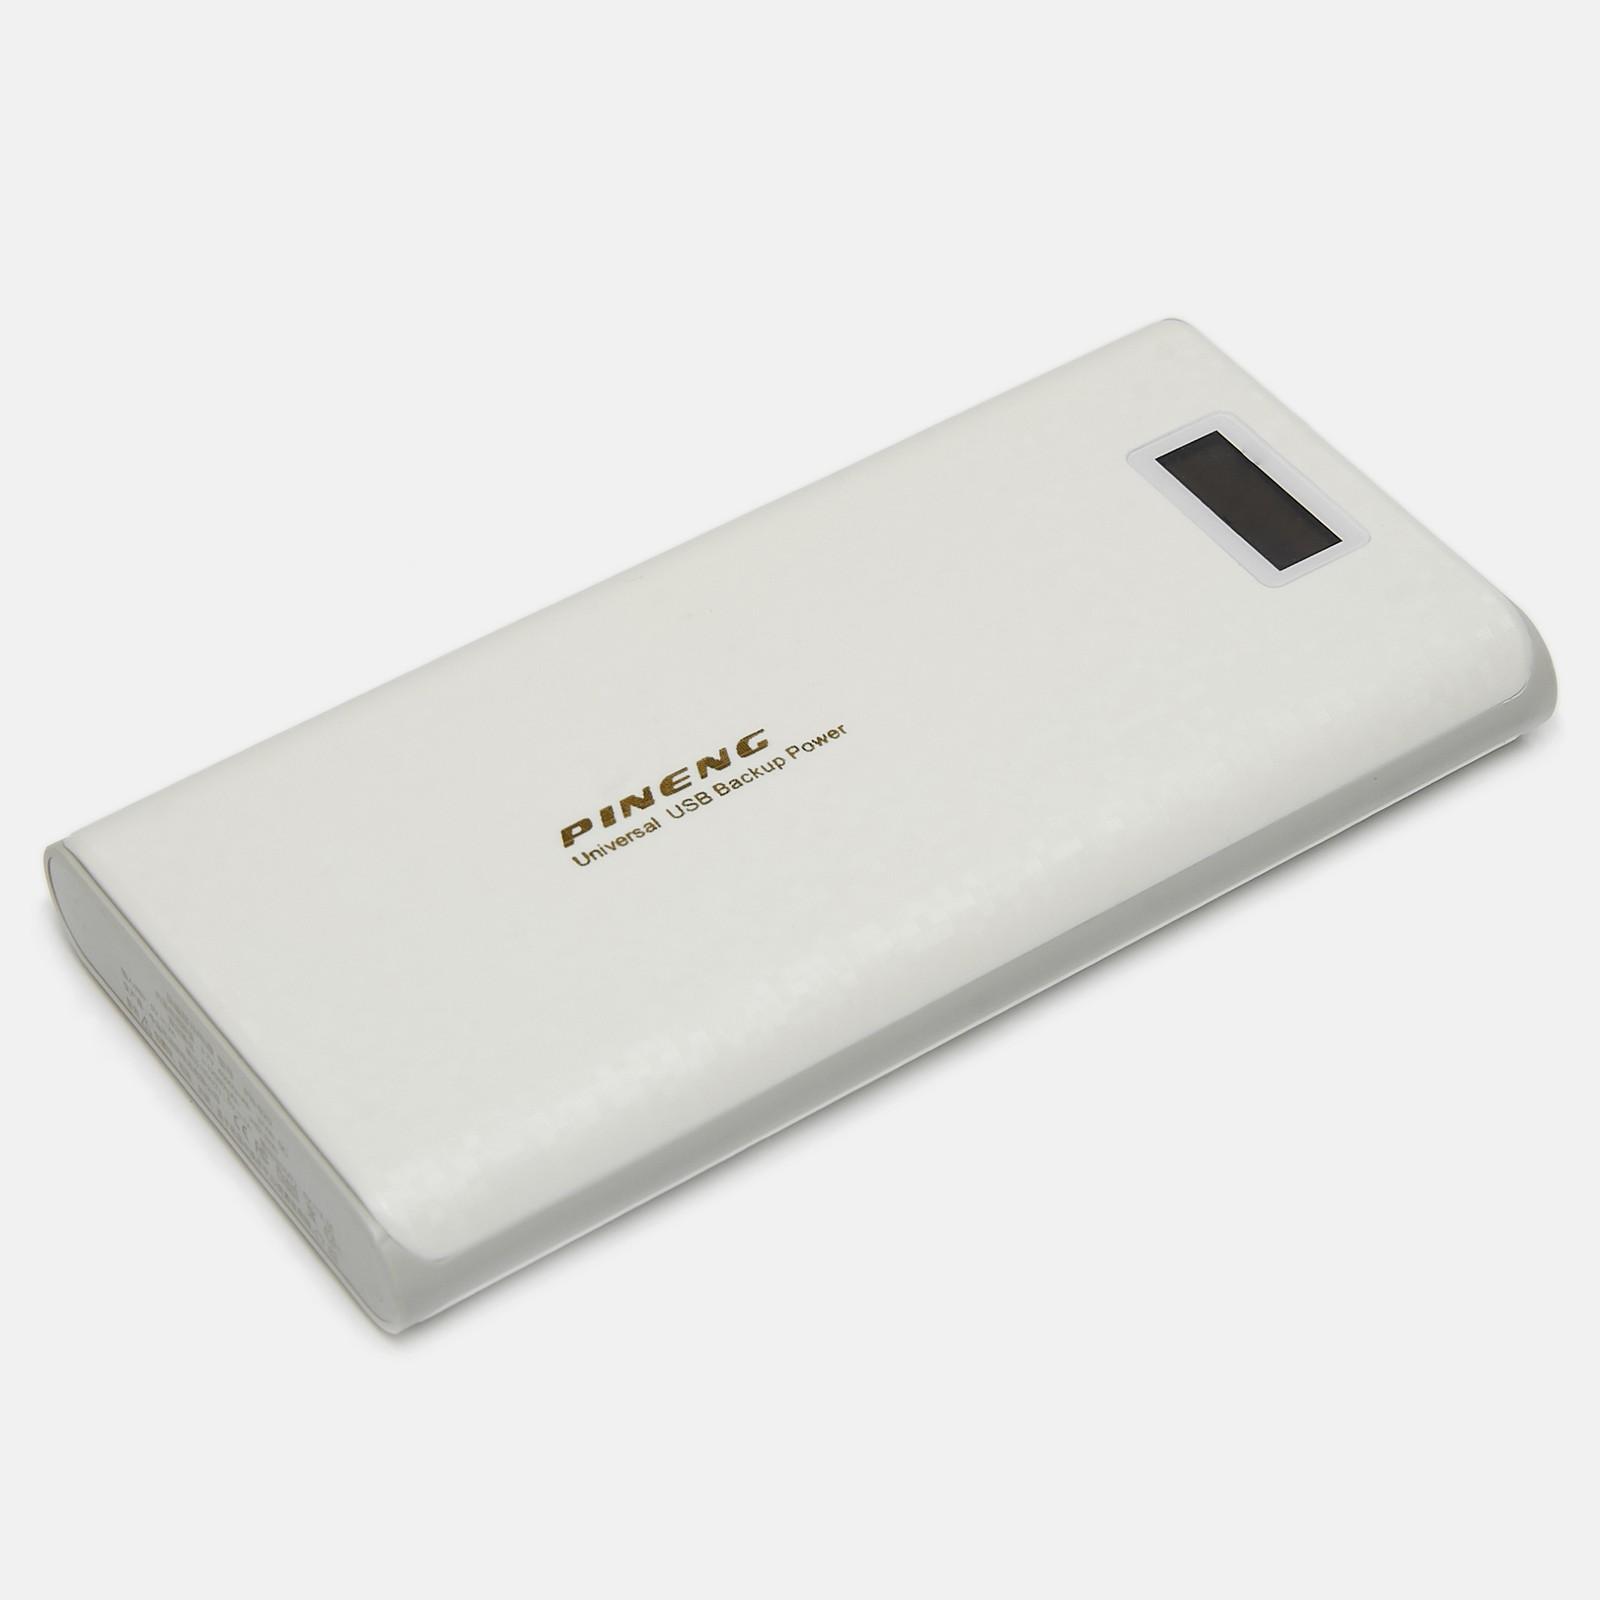 Внешний аккумулятор Pineng PN-920 40000 (9000) мАч White